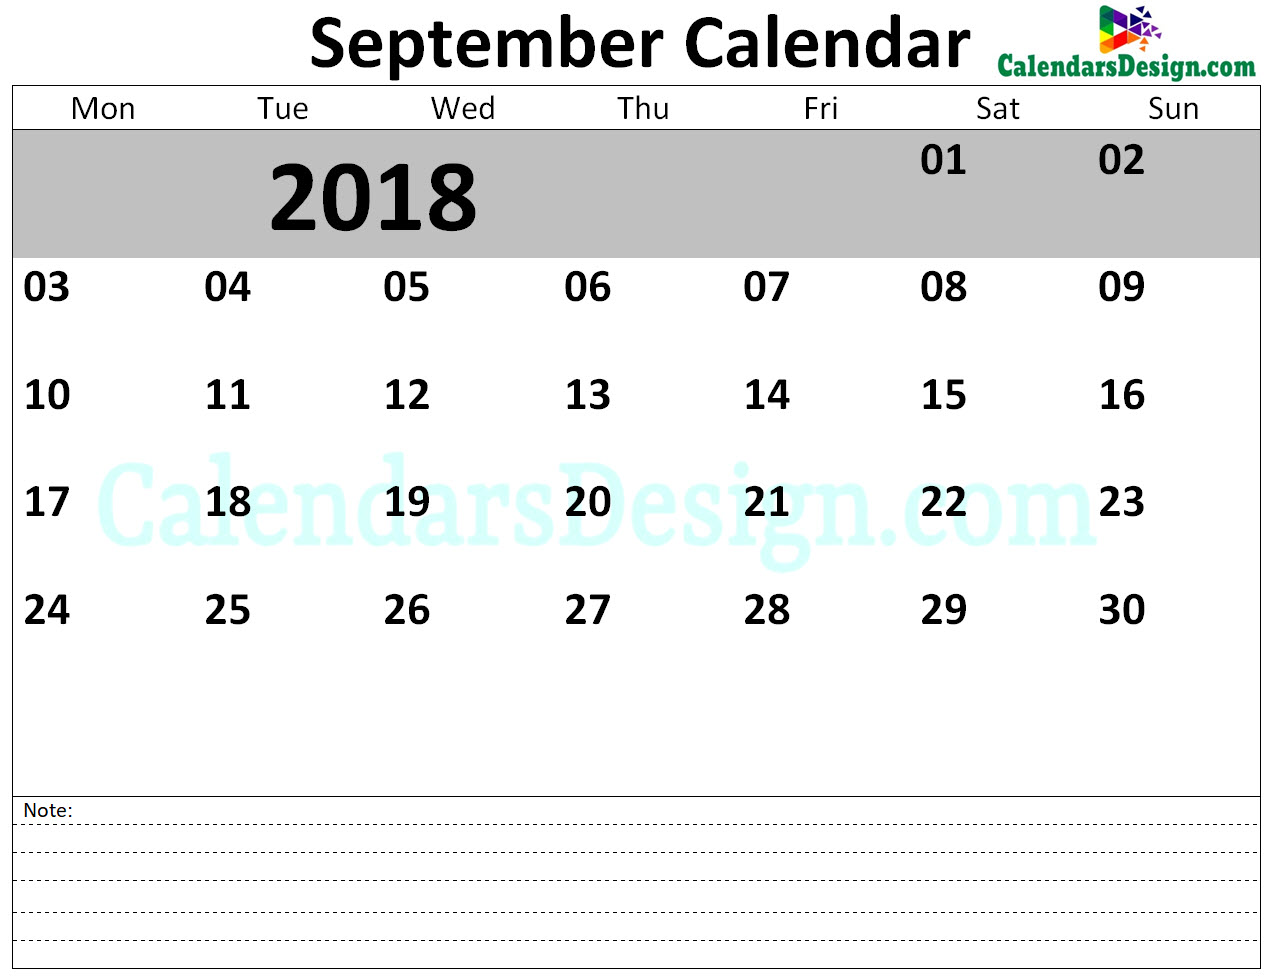 September 2018 Calendar Blank Template